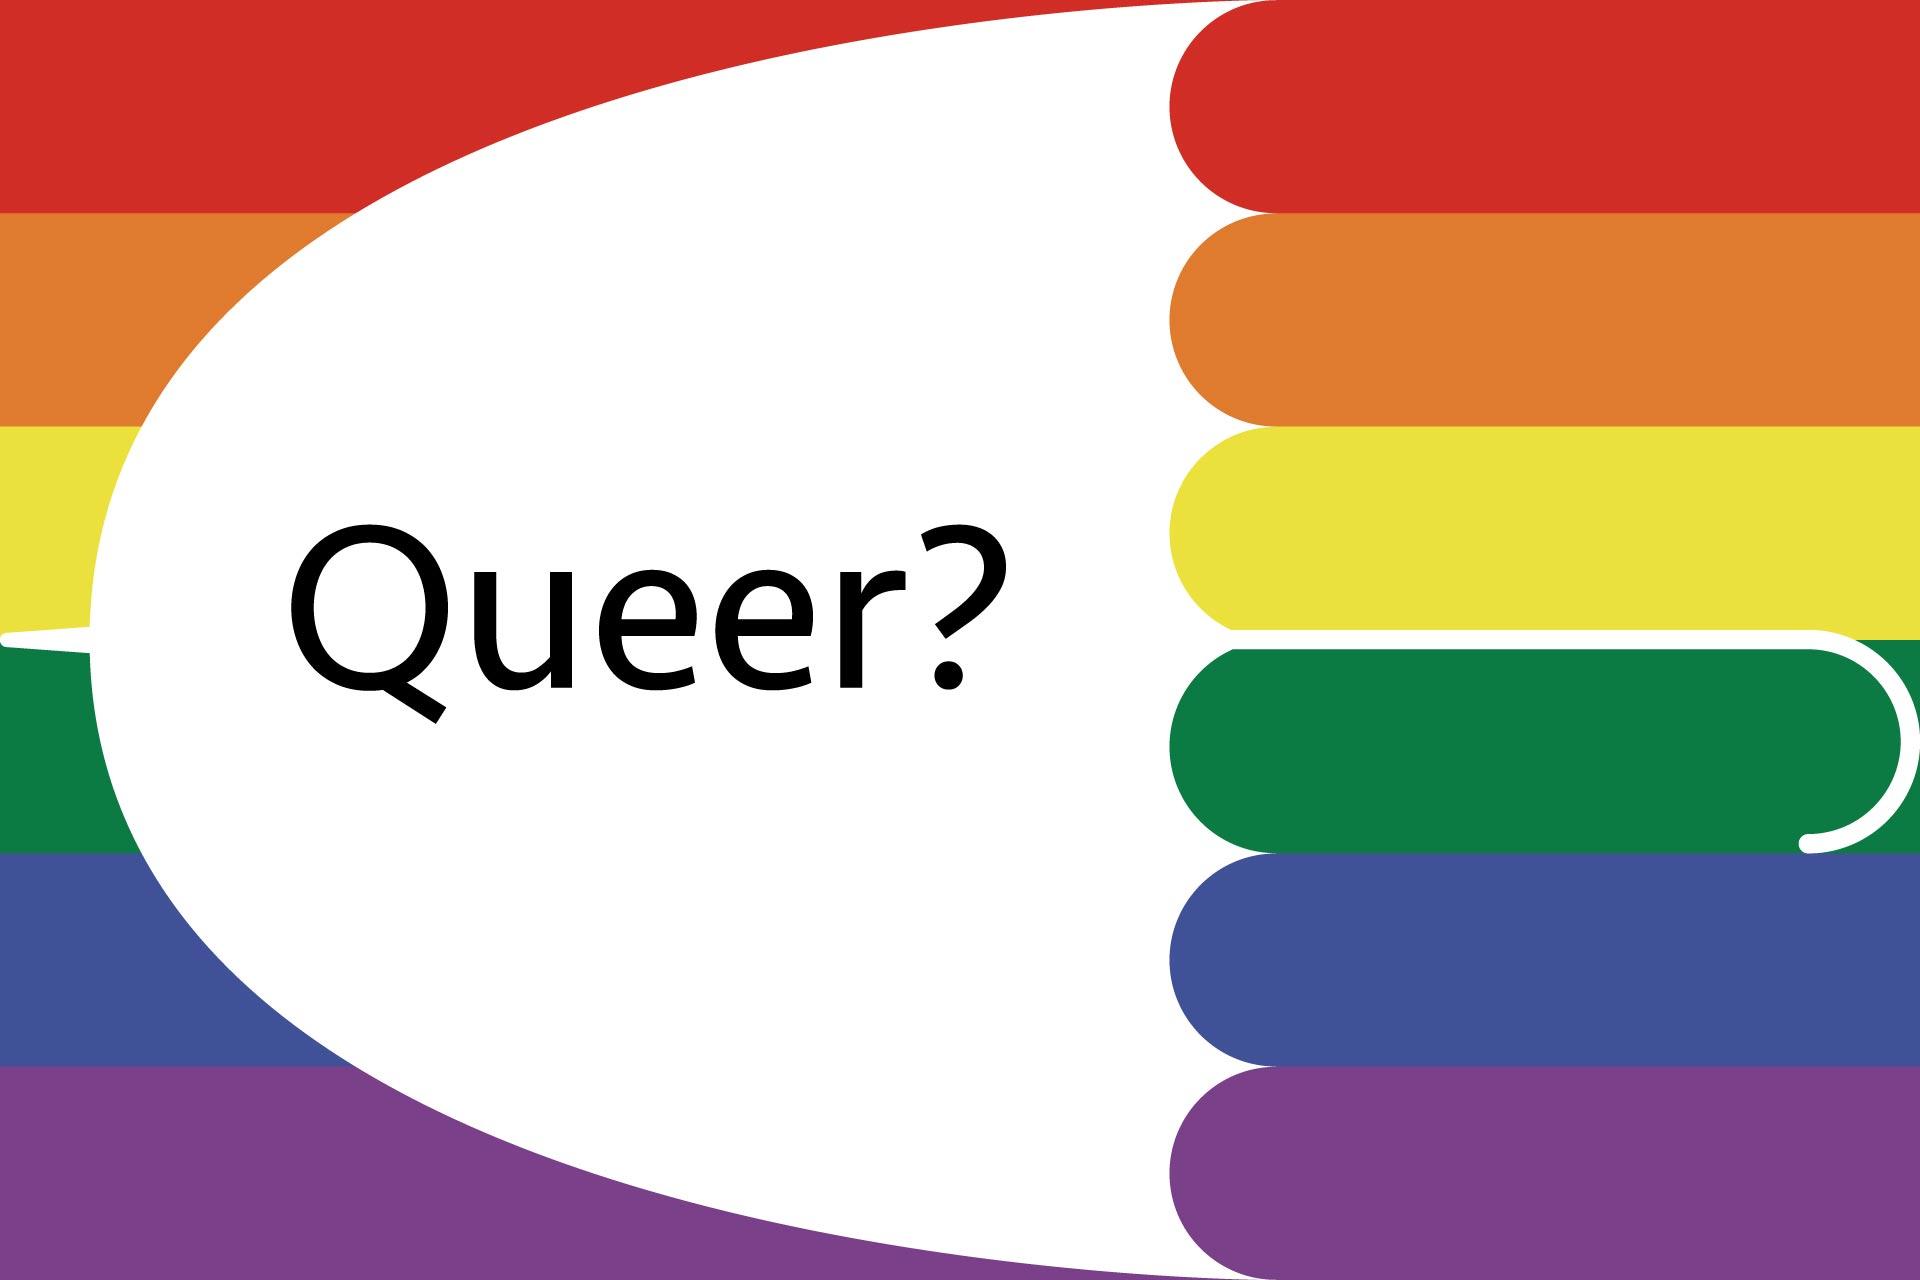 cosa significa queer